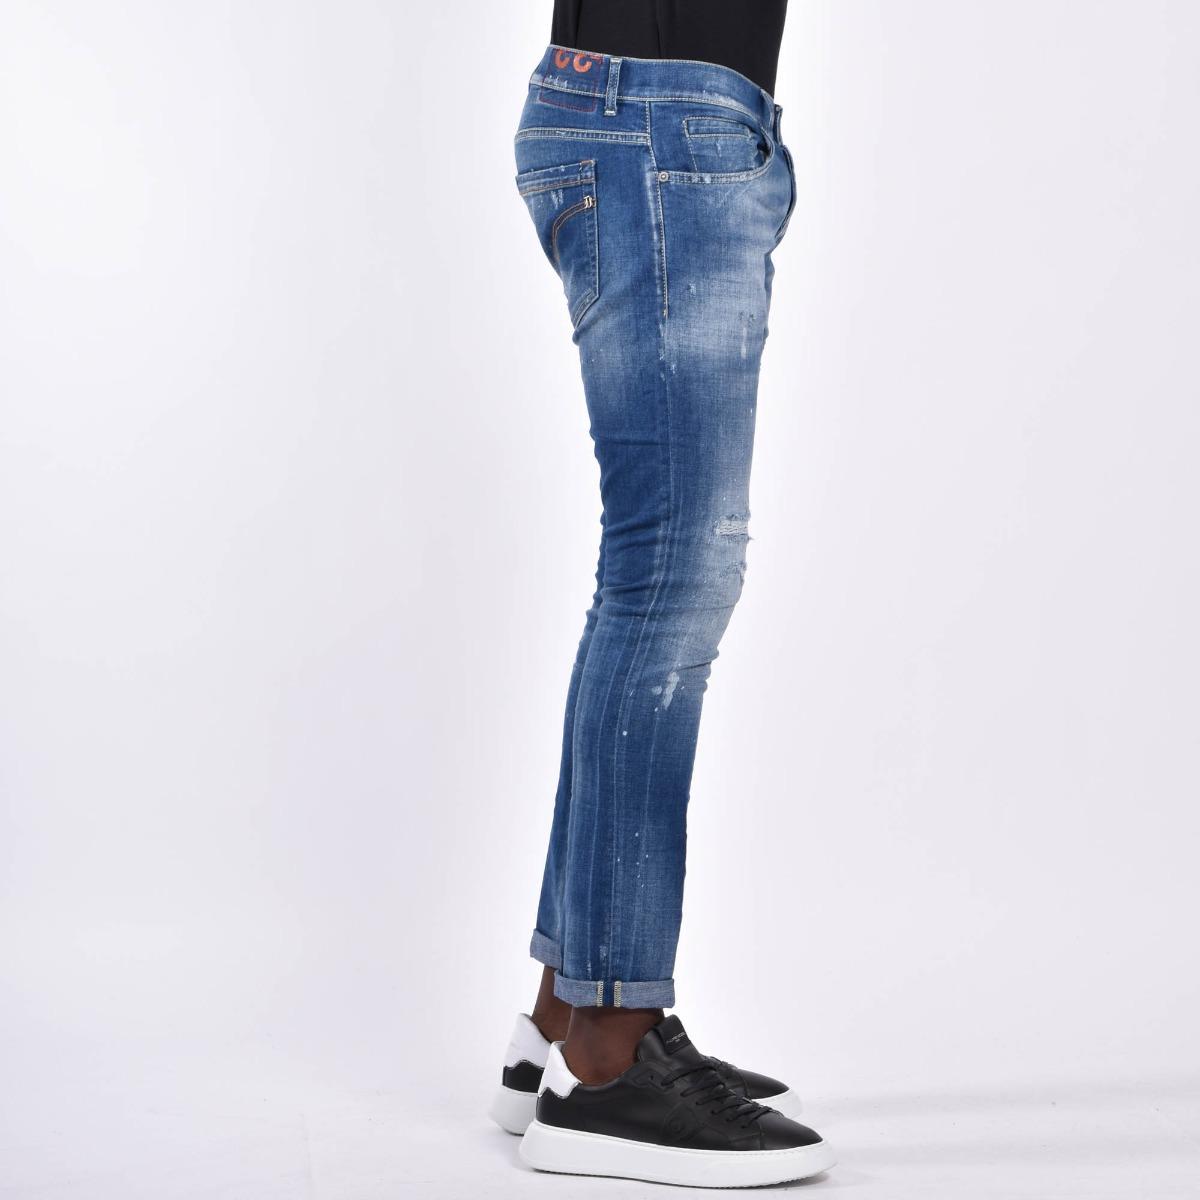 Pantalone george- Denim medio